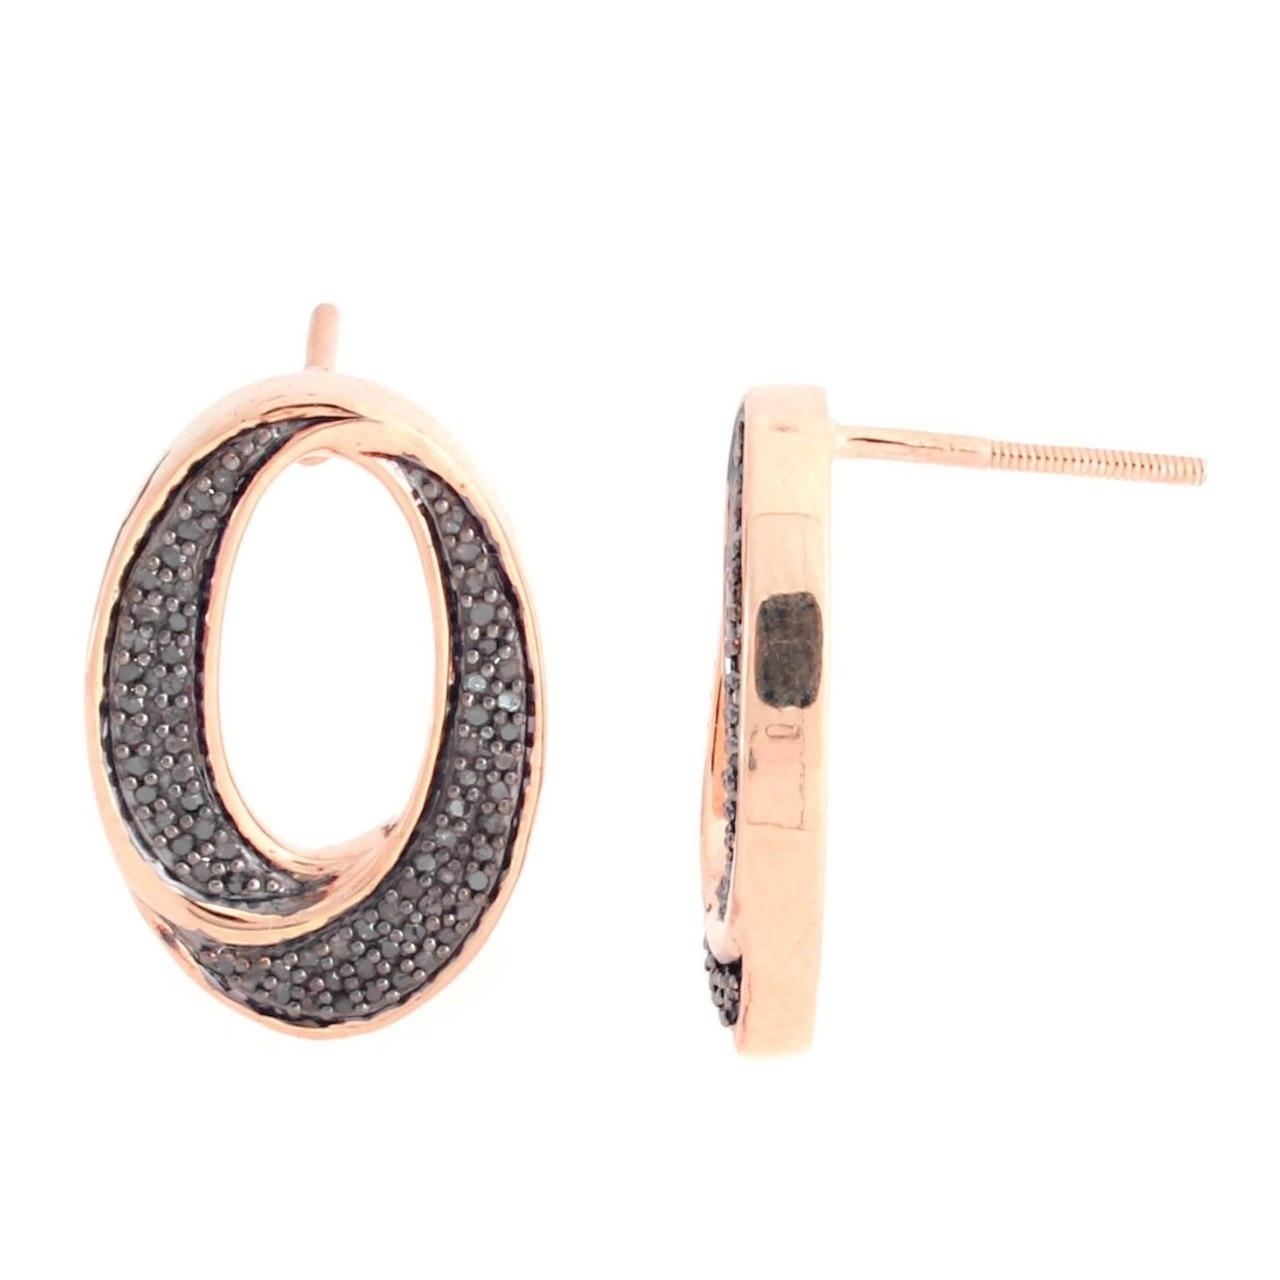 18K Rose Gold Over Sterling Silver 0.30 ct Black Diamond Stud Earrings Q608 (1)